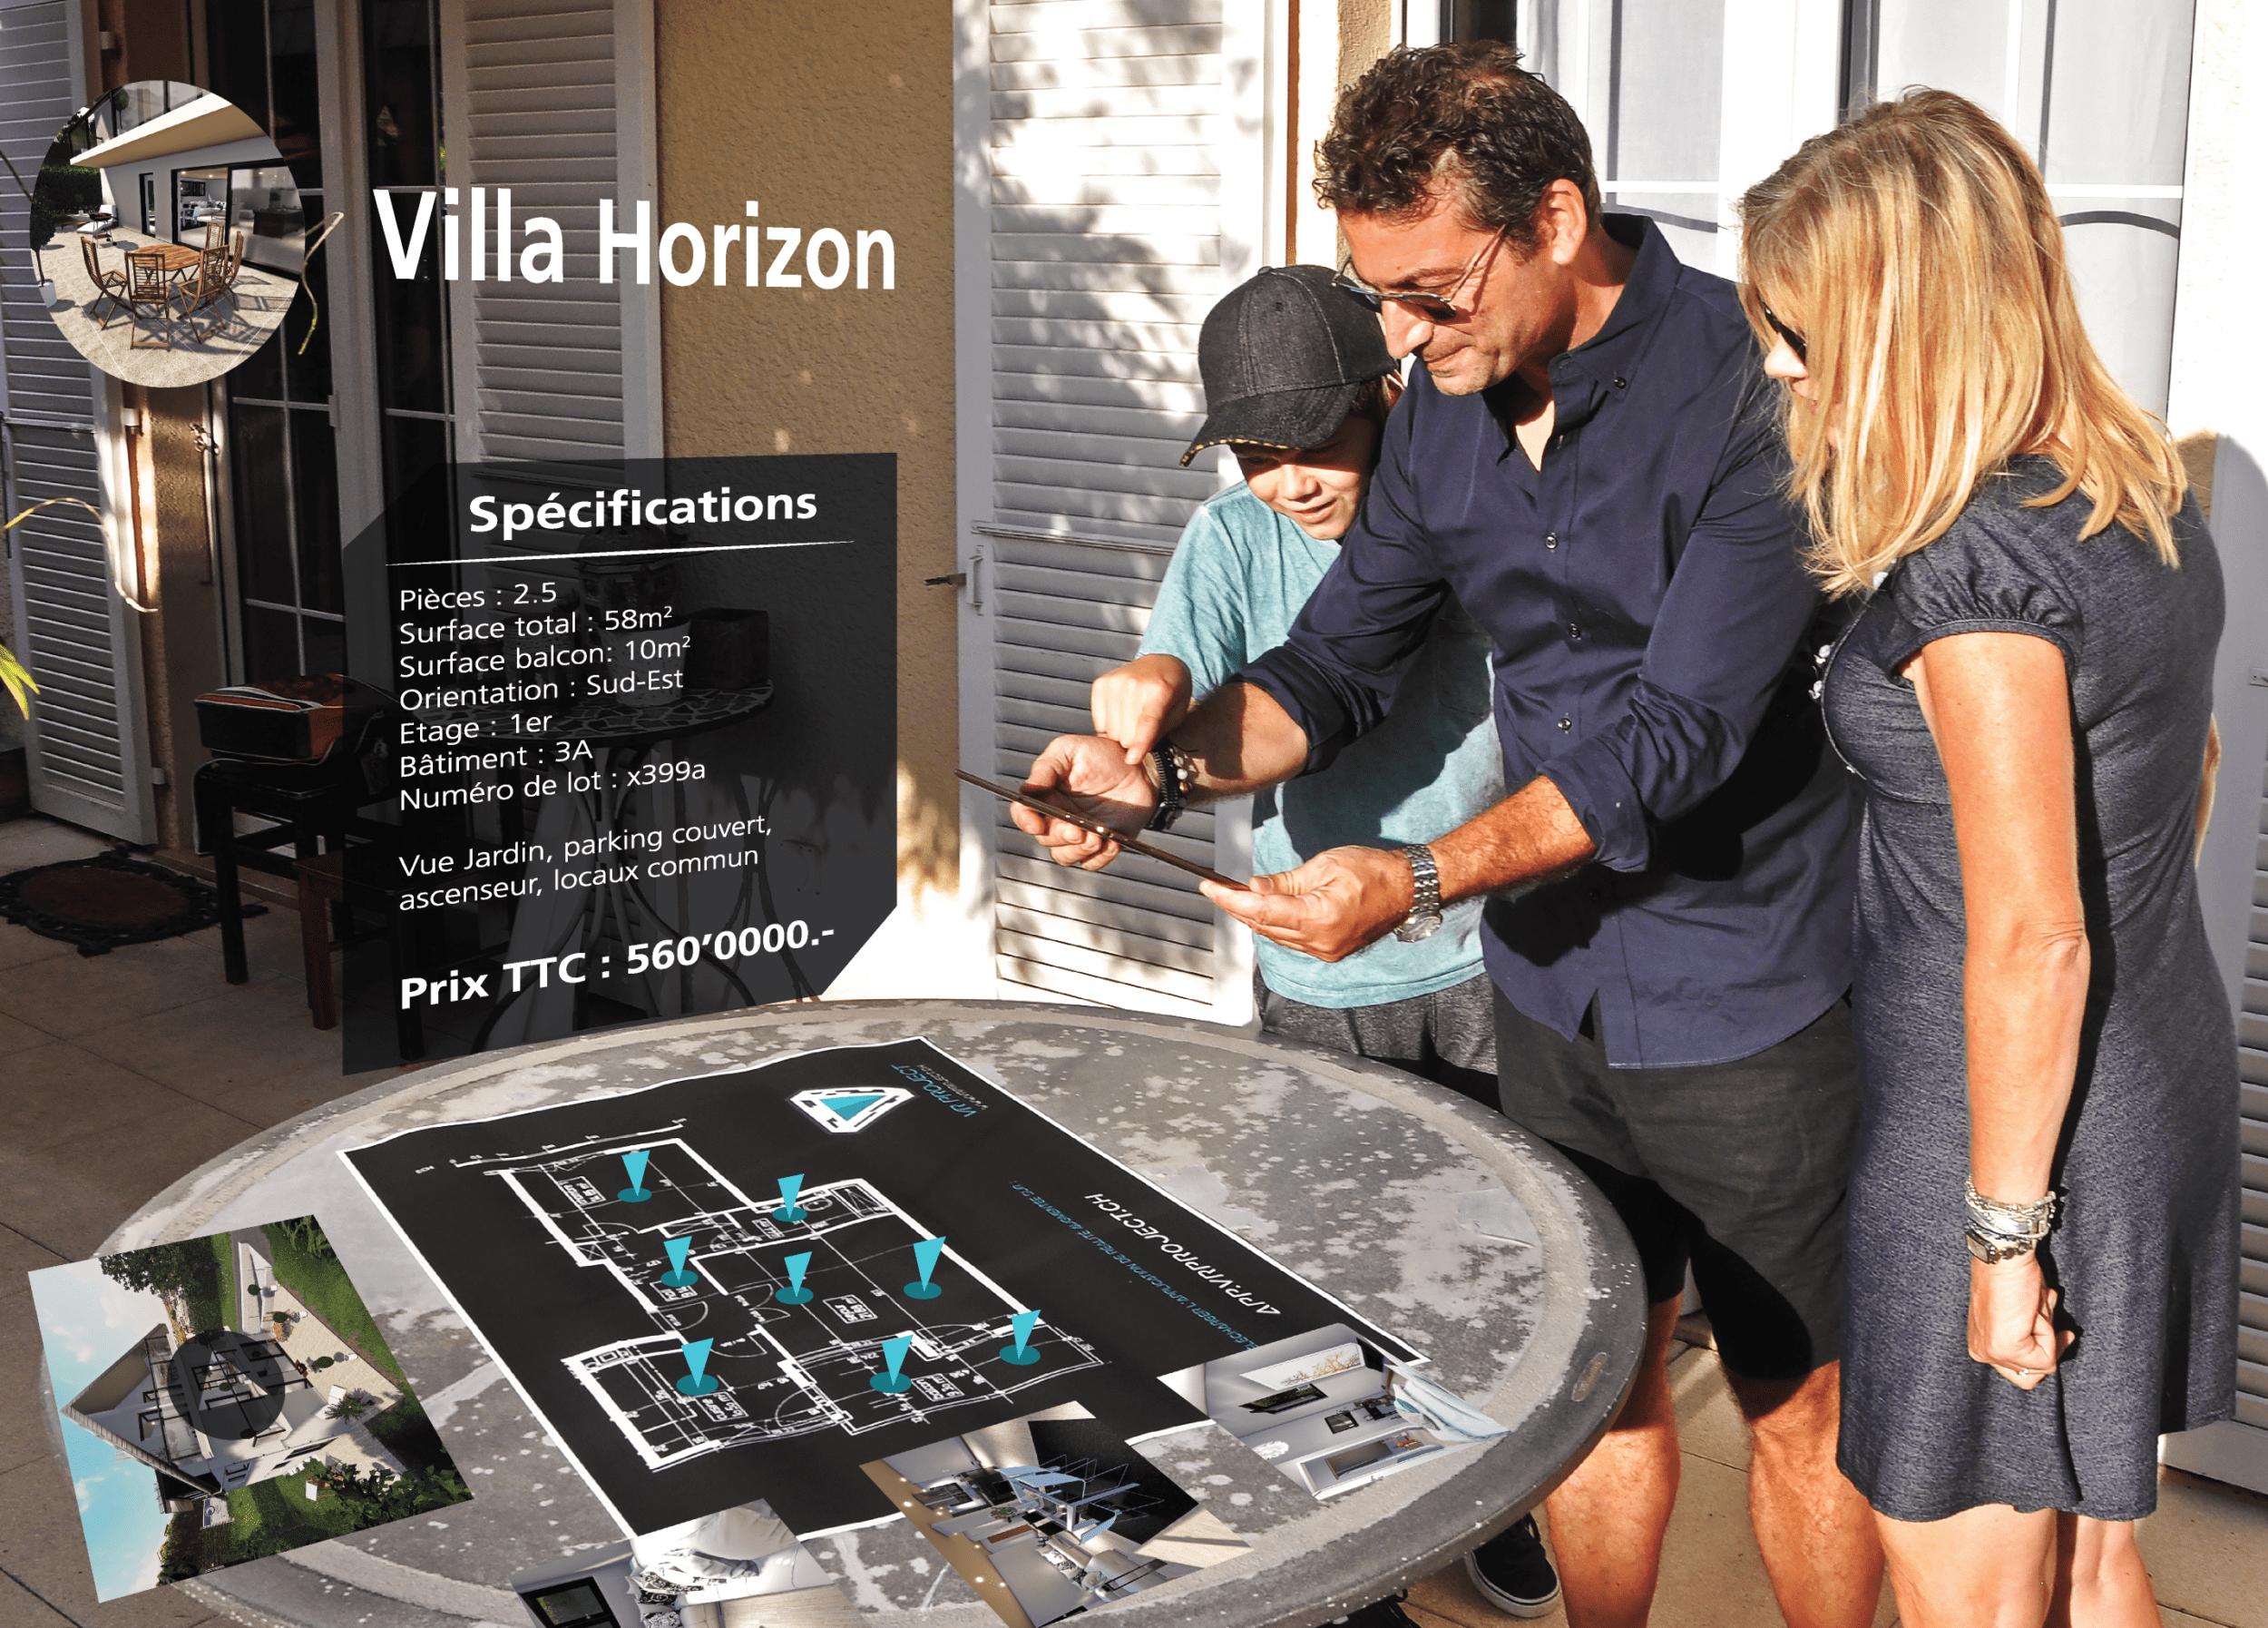 Augmented reality - VISION platform